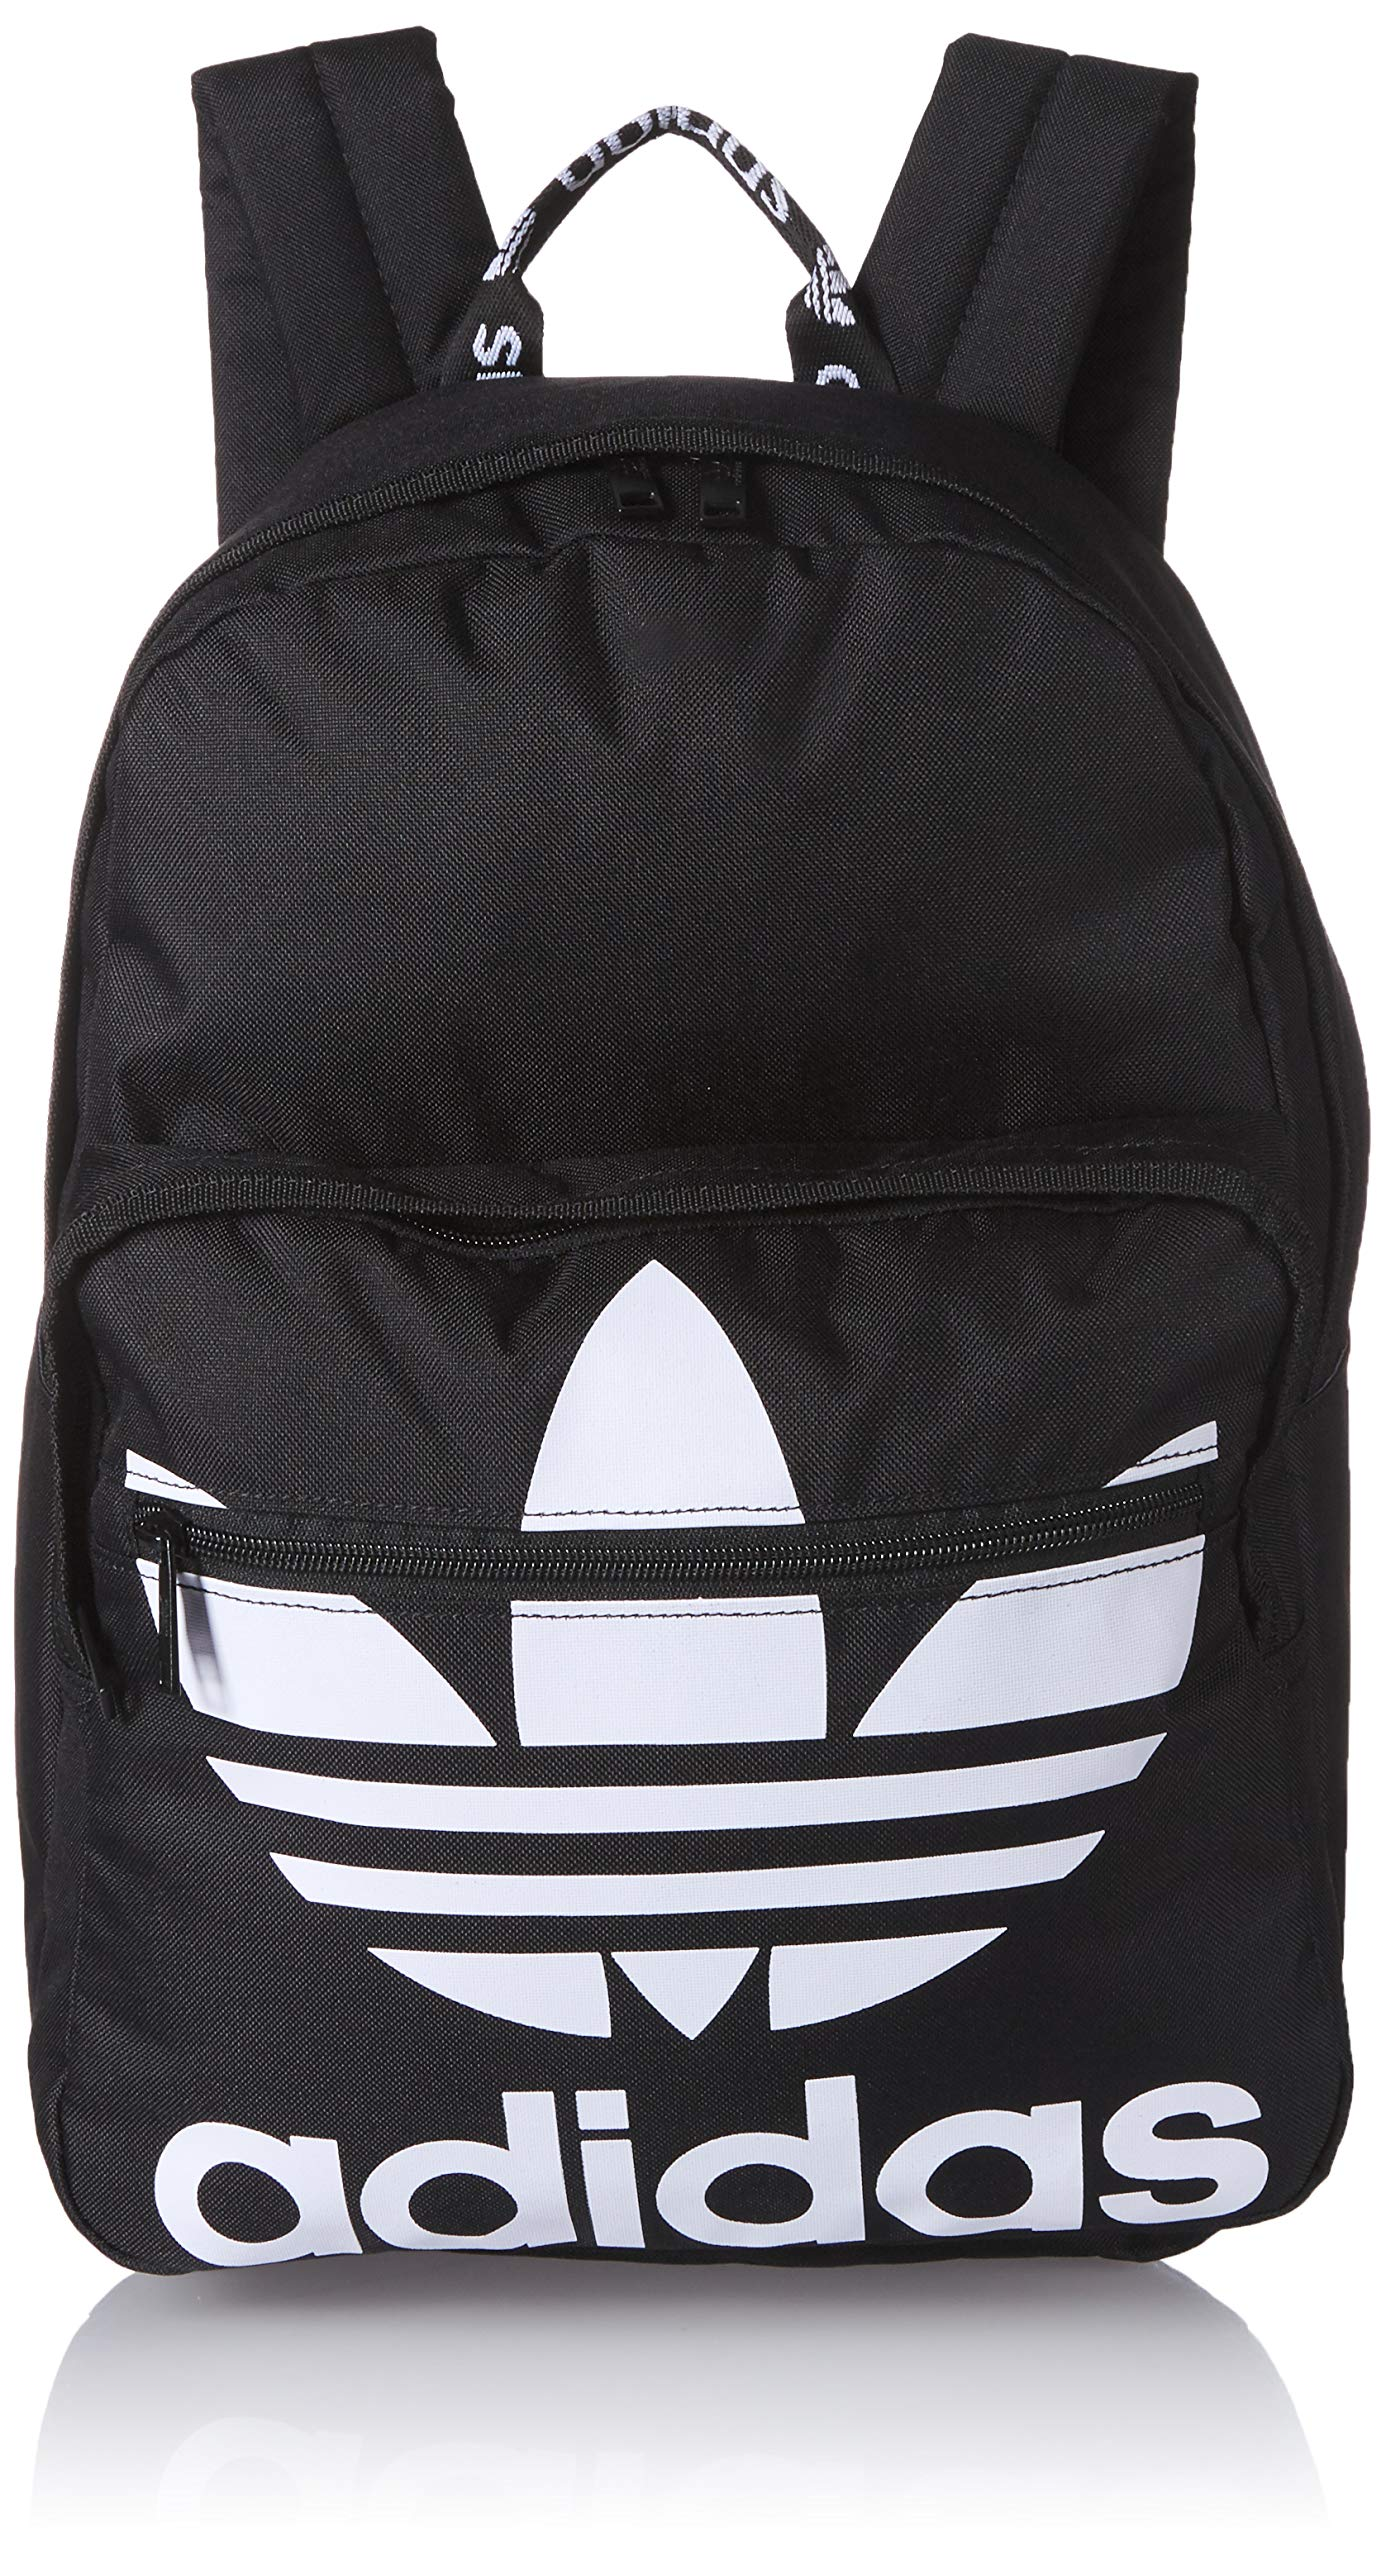 adidas Originals Unisex Trefoil Pocket Backpack, Black/White, ONE SIZE by adidas Originals